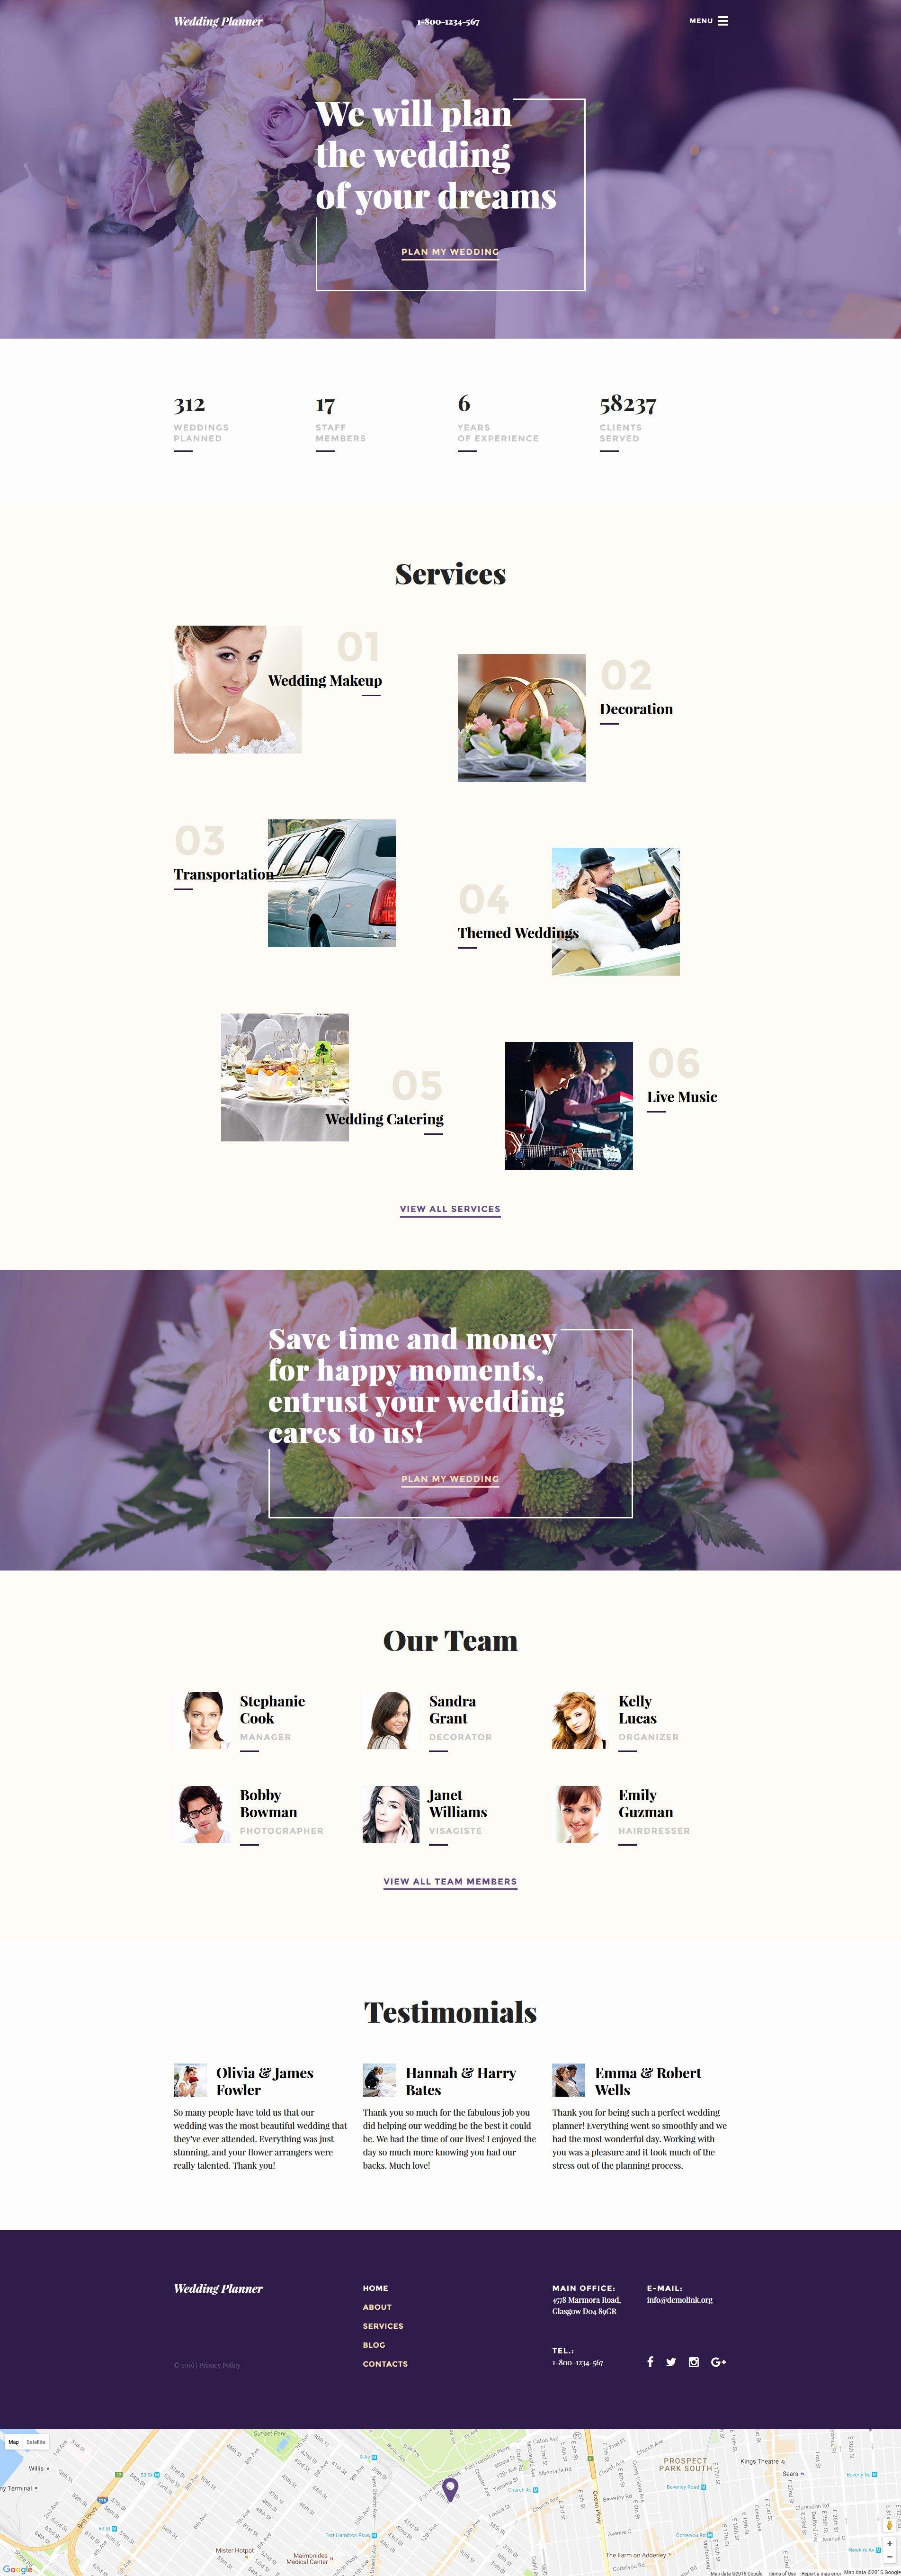 Wedding Planner Website Template Lovely Wedding Planner Web Template